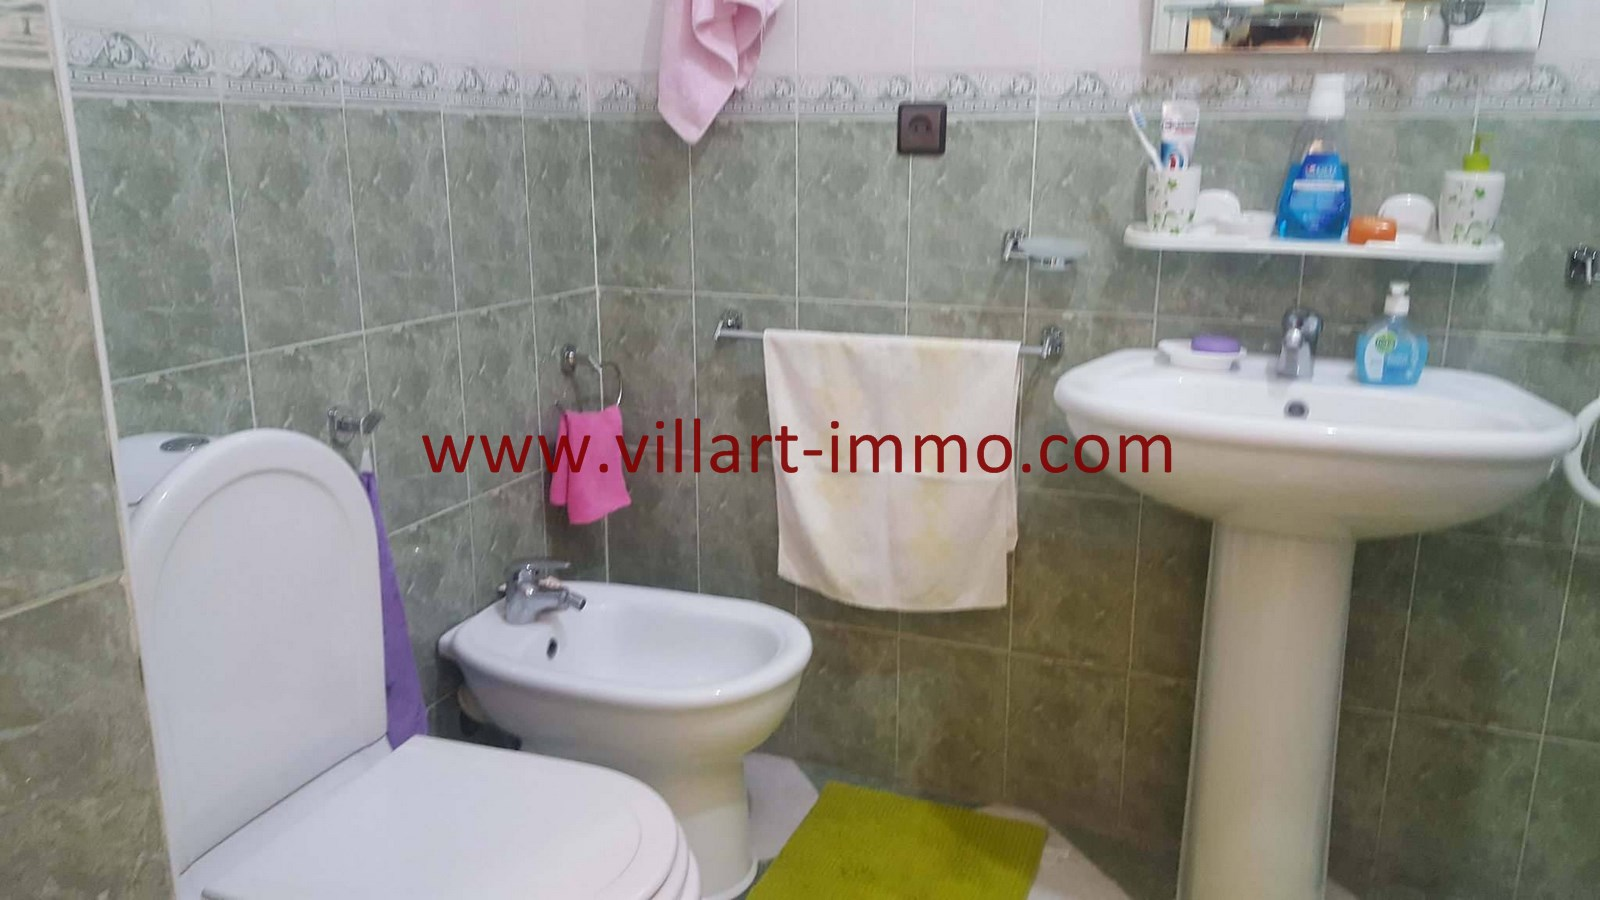 10-Vente-Appartement-Centre-ville-Tanger-Salle de bain-VA531-Villart Immo